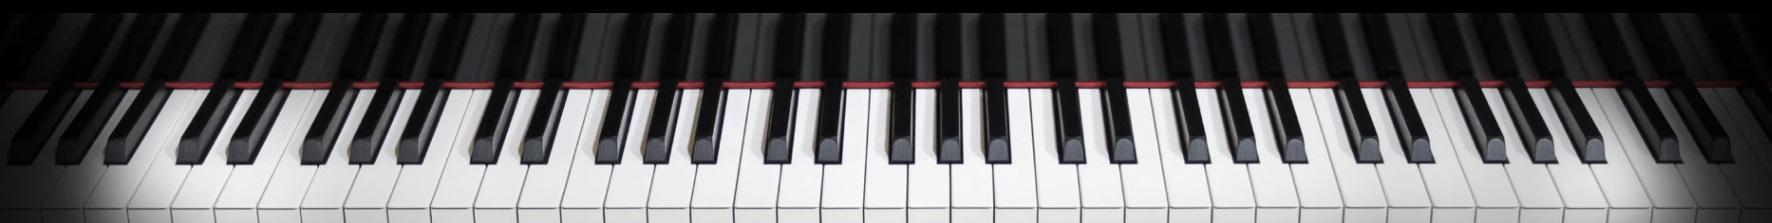 pianist till fest musik bakgrund event